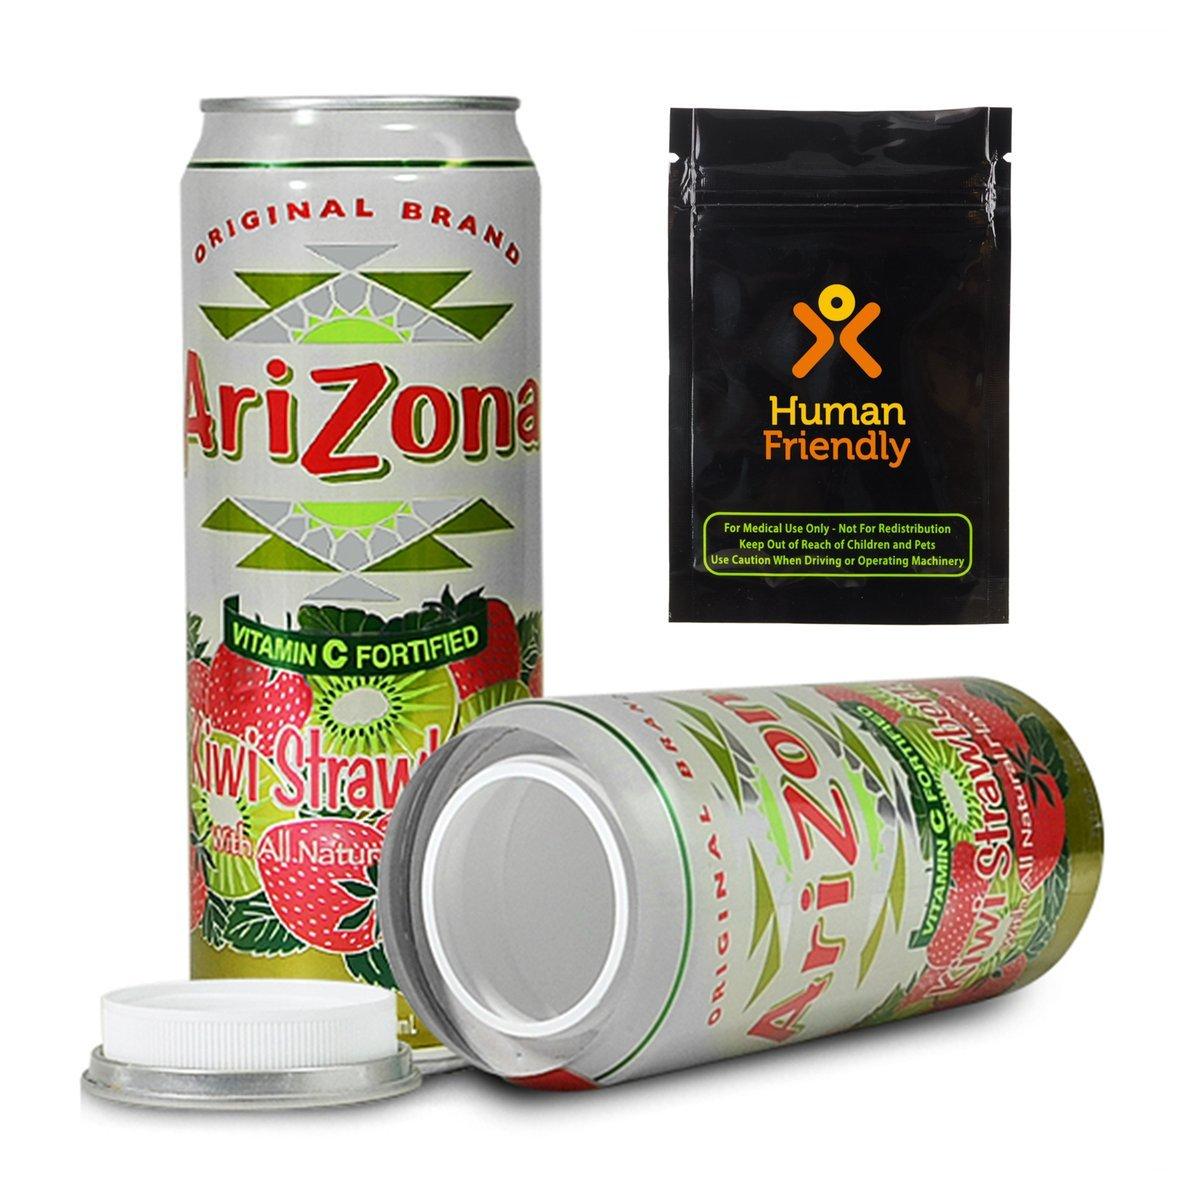 Arizona Kiwi Strawberry DiversionセーフStash Can 23オンスW humanfriendly smell-proofバッグ B0753KM4HW